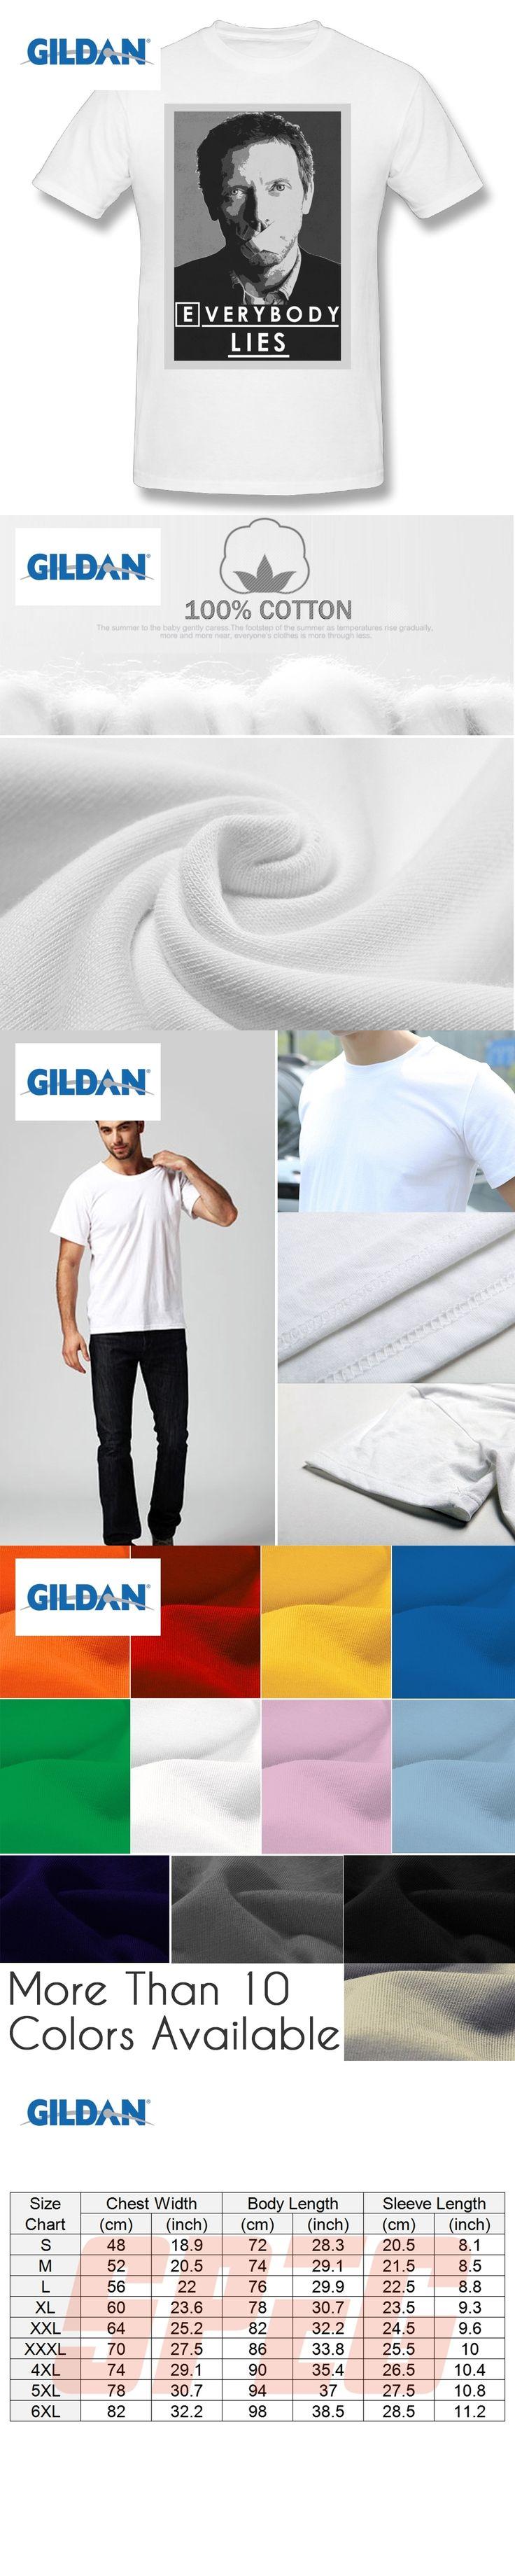 GILDAN Men T Shirts Everybody Lies T-Shirt Dr House MD Mens Tops Man Round Neck Short Sleeve T-Shirt Hot Sale New Male